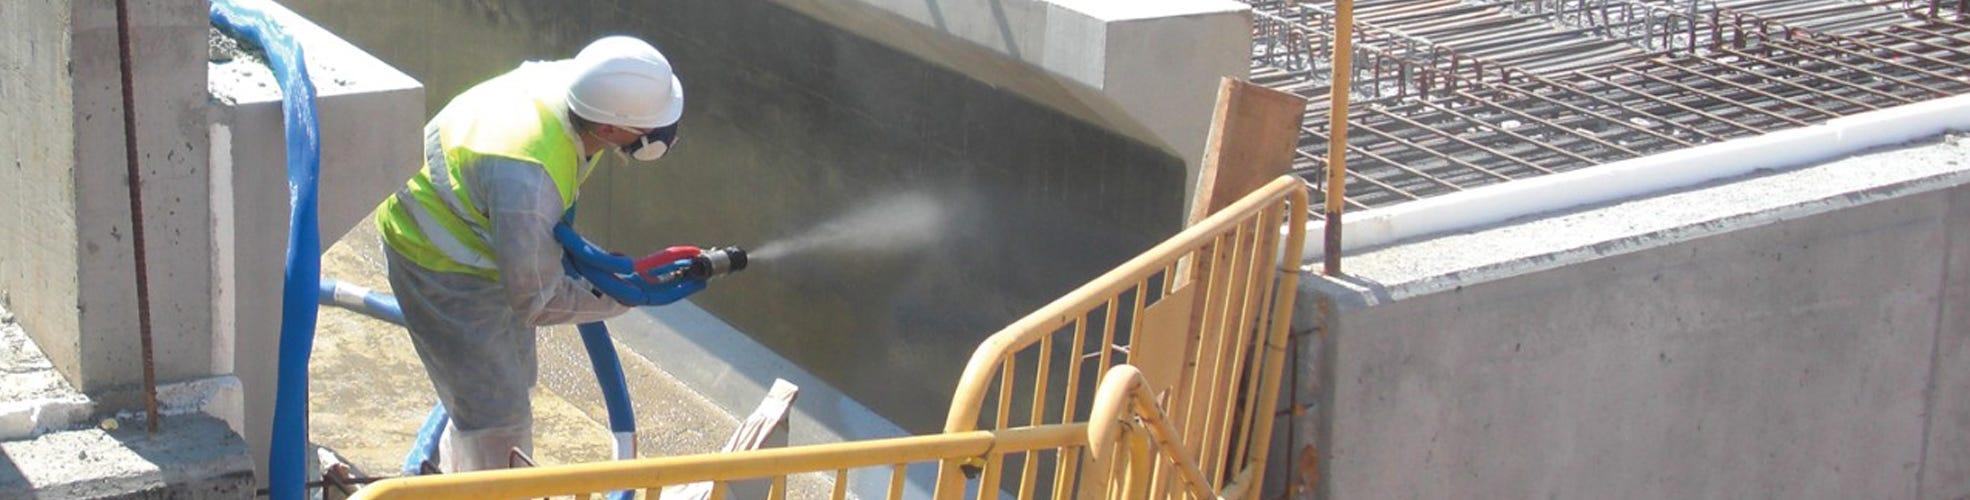 Plural Component Sprayers